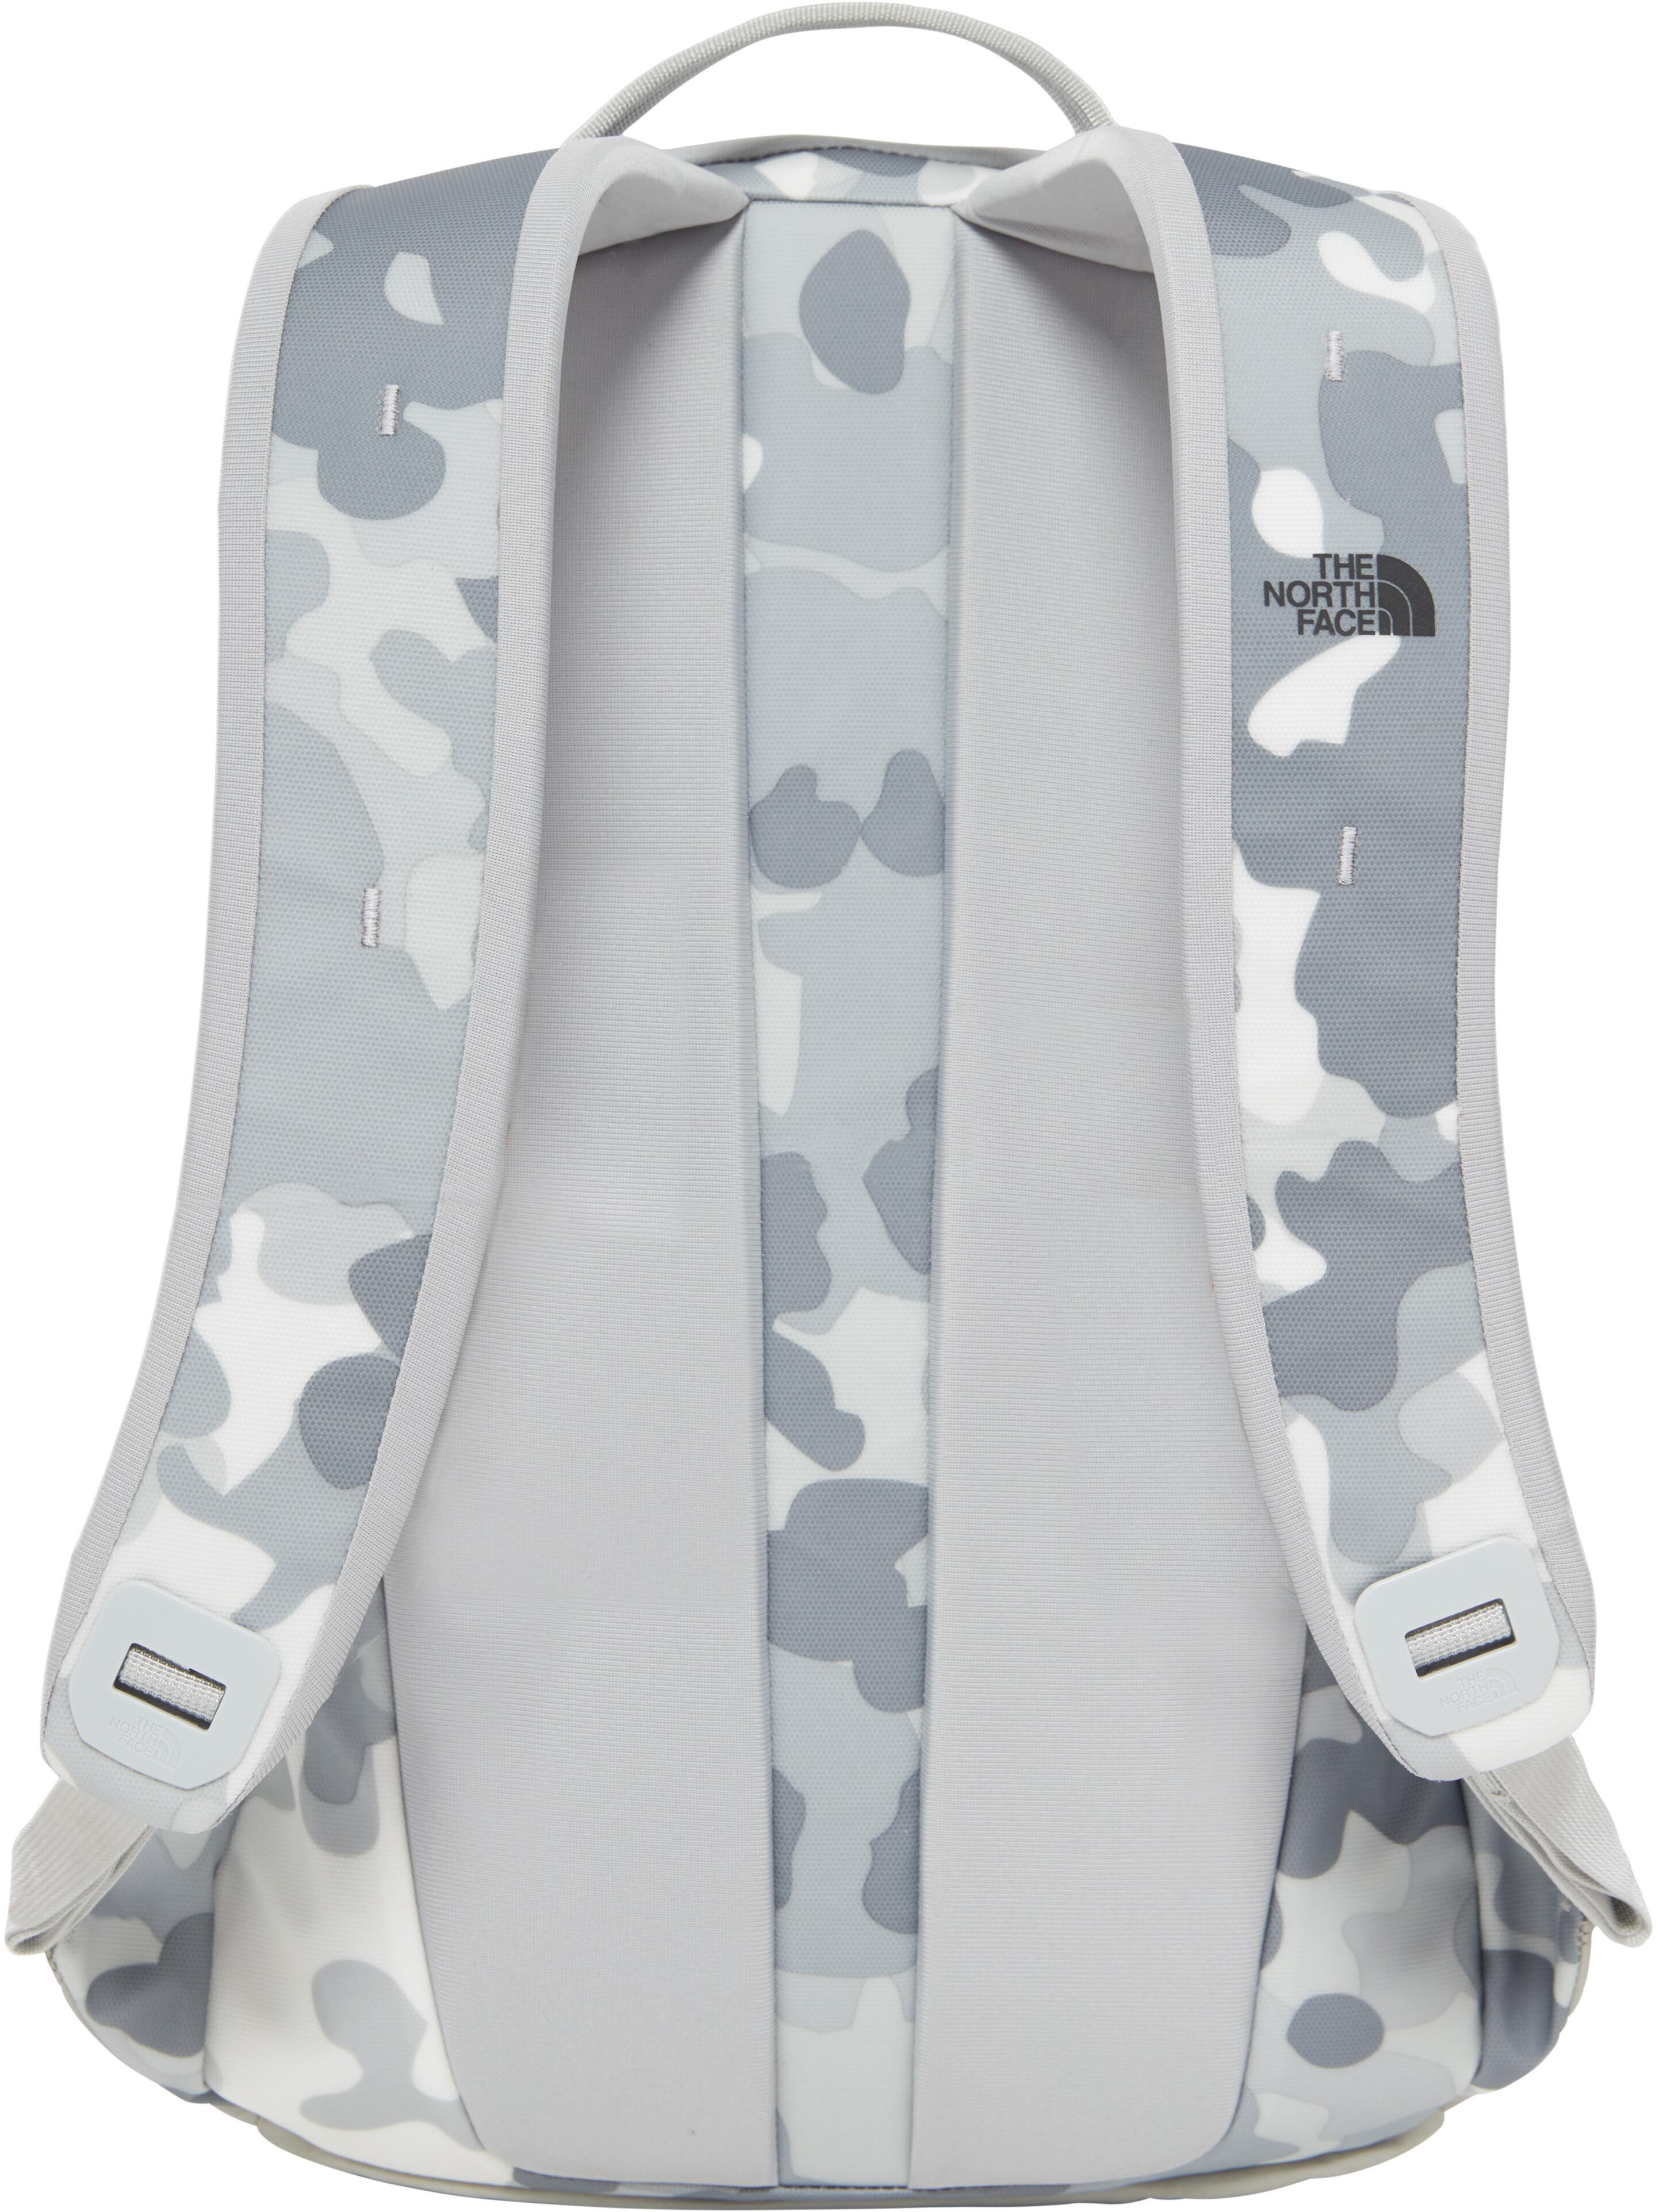 e8566e0dda The North Face BTTFB Special Edition Zaino, tnf white macrofleck camo  print/high rise grey